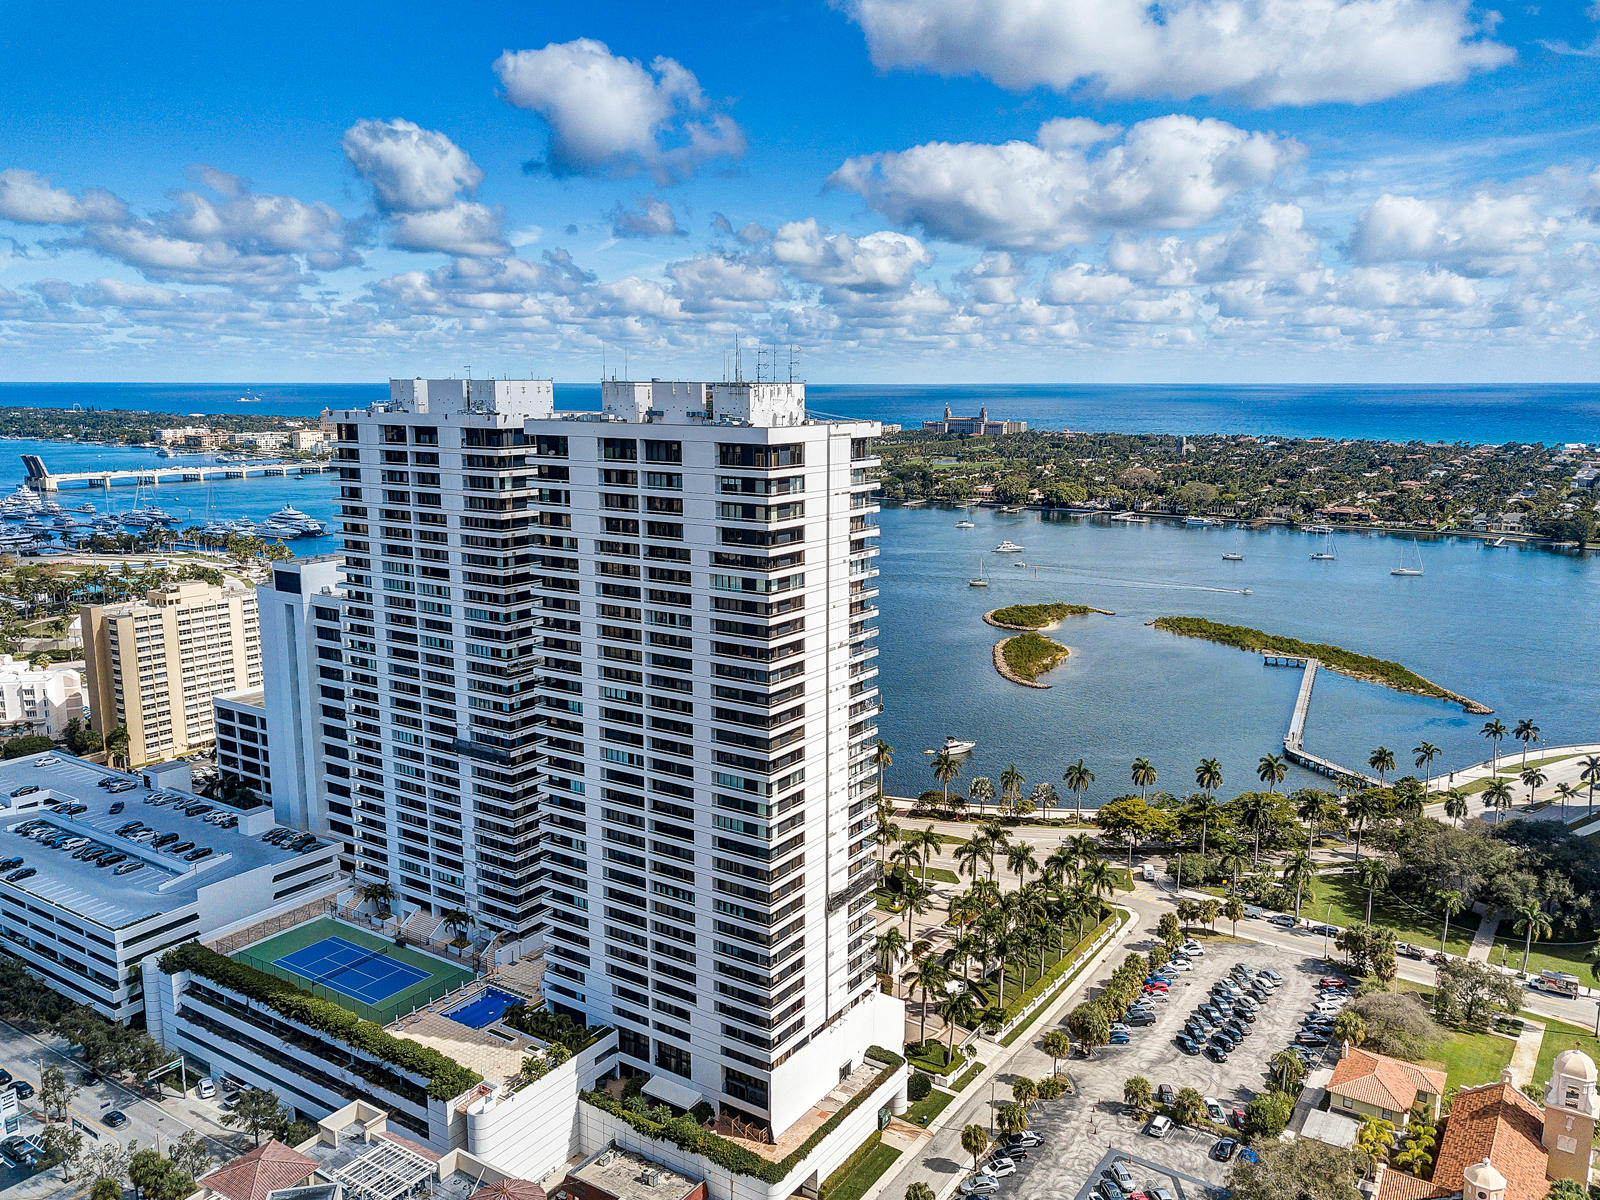 Photo of 529 S Flagler Drive #29e, West Palm Beach, FL 33401